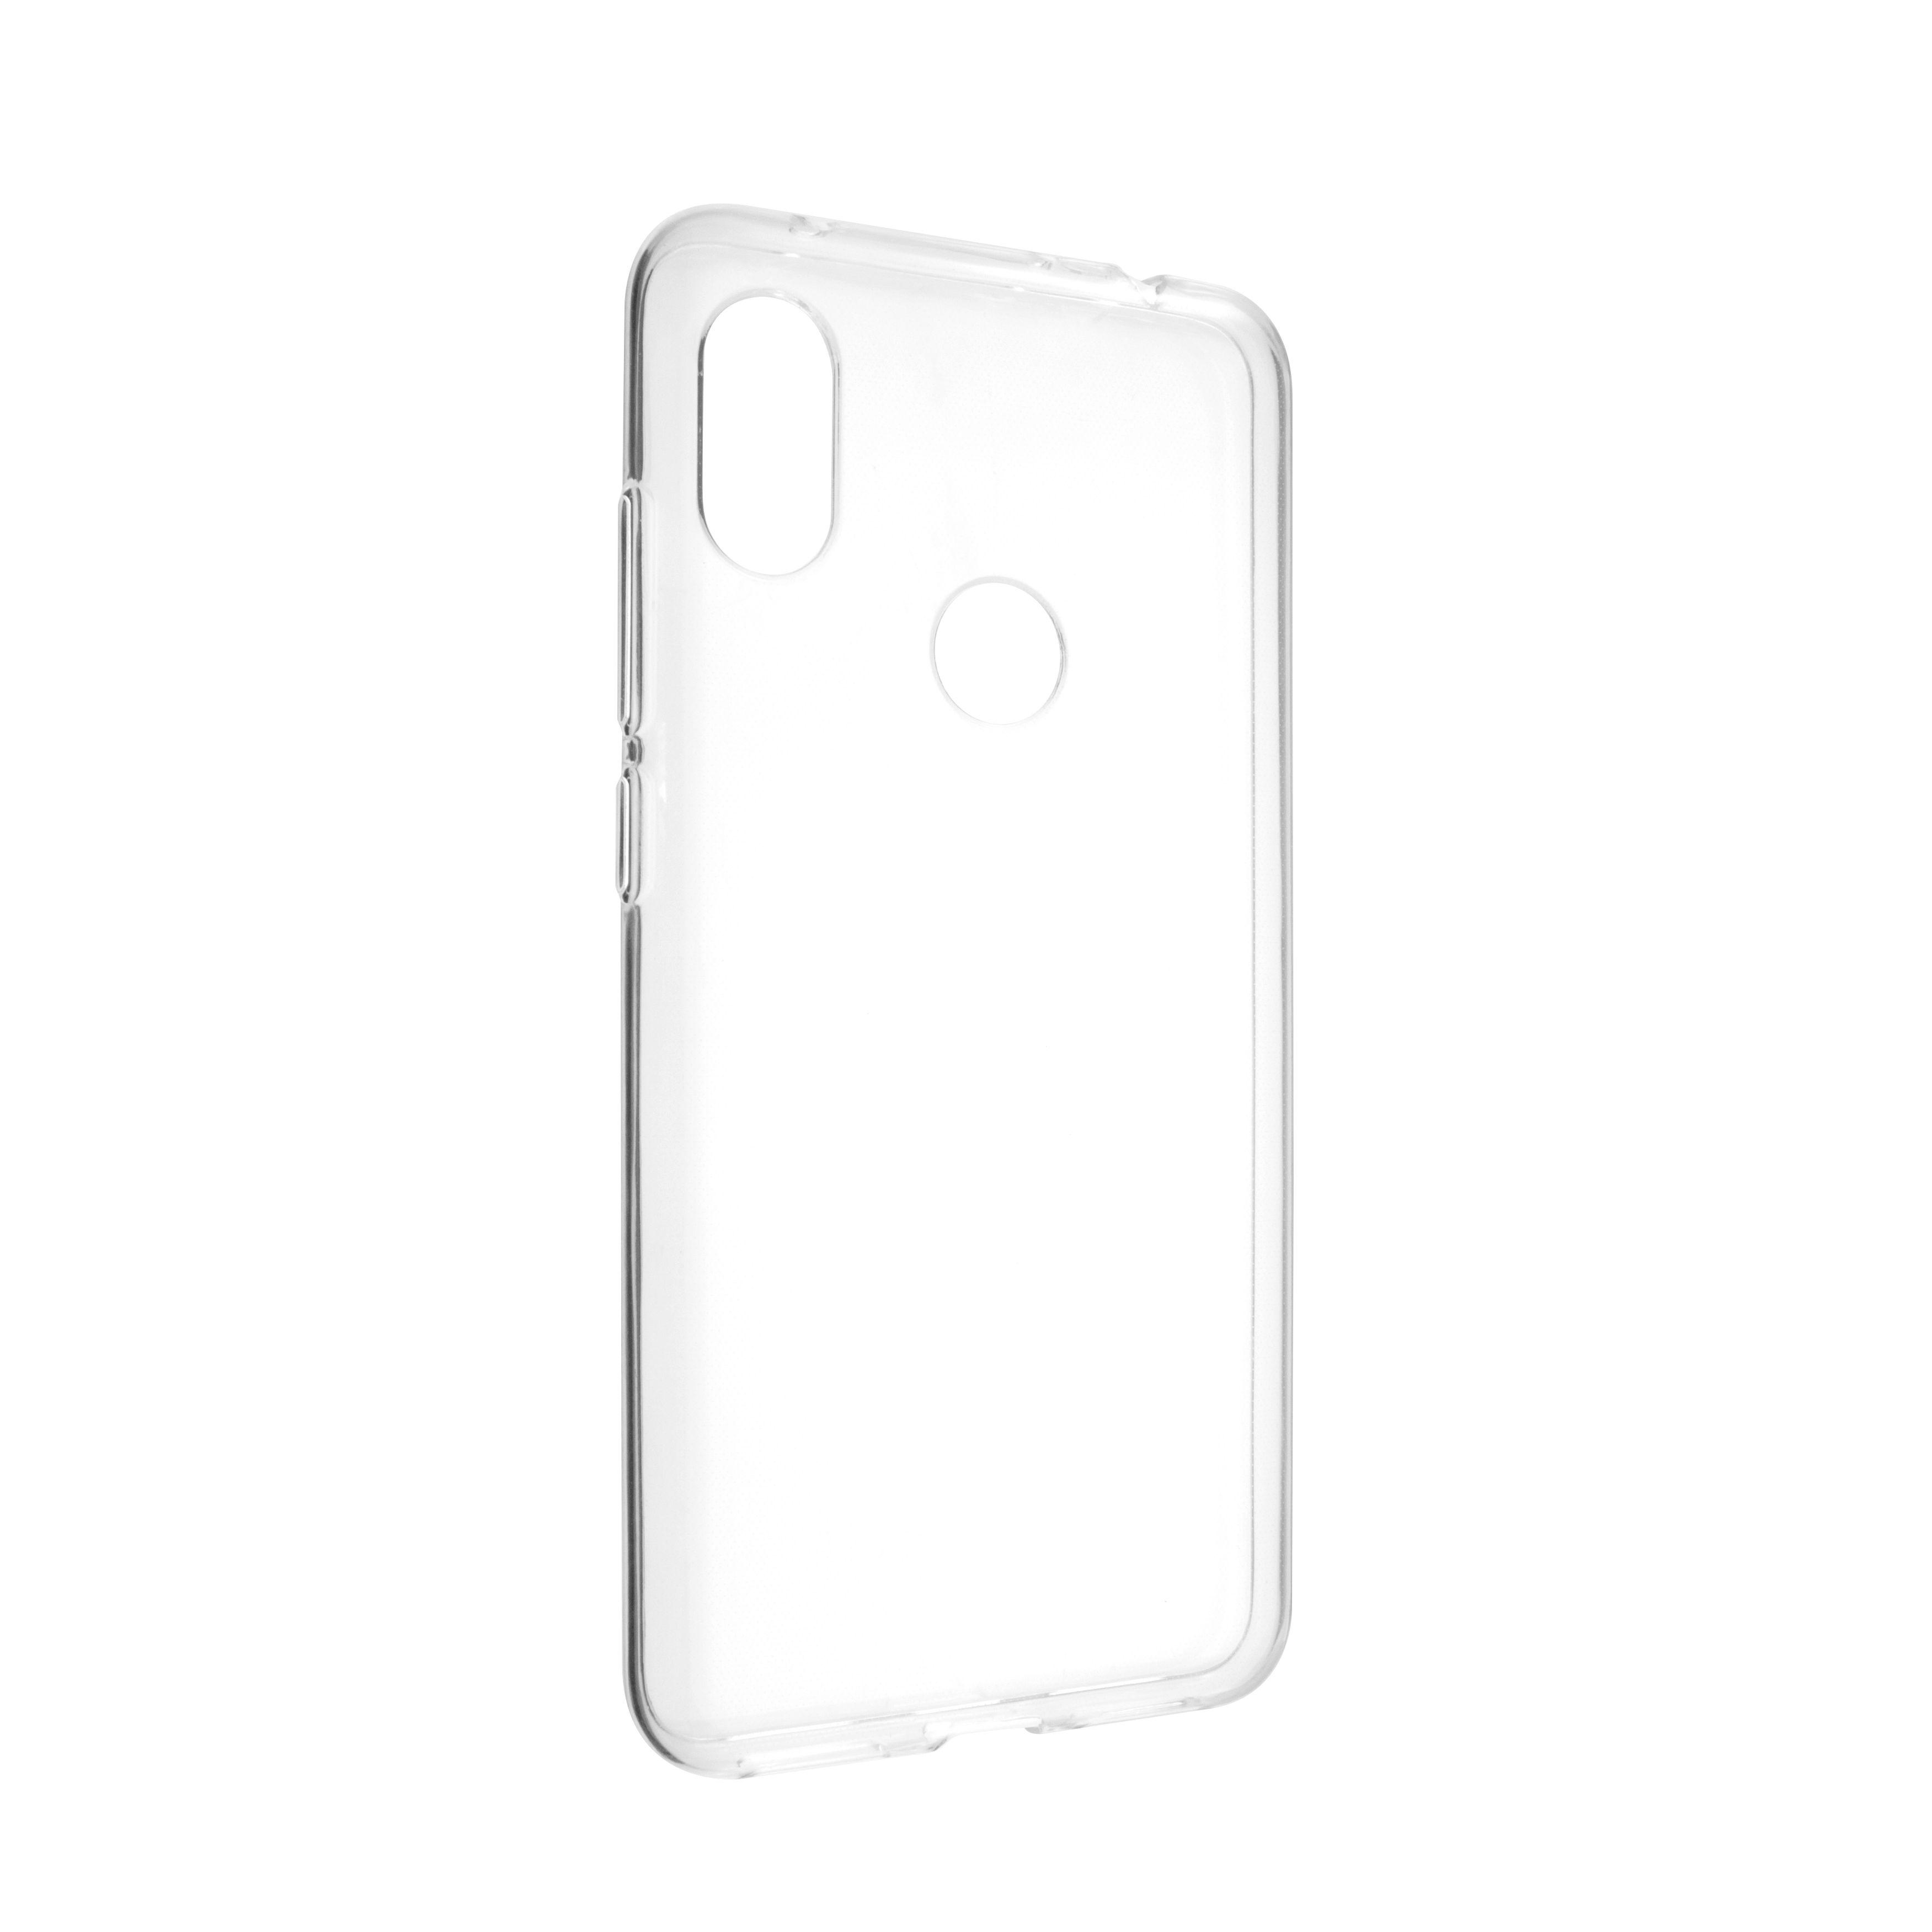 TPU gelové pouzdro FIXED pro Xiaomi Redmi Note 6 Pro, čiré